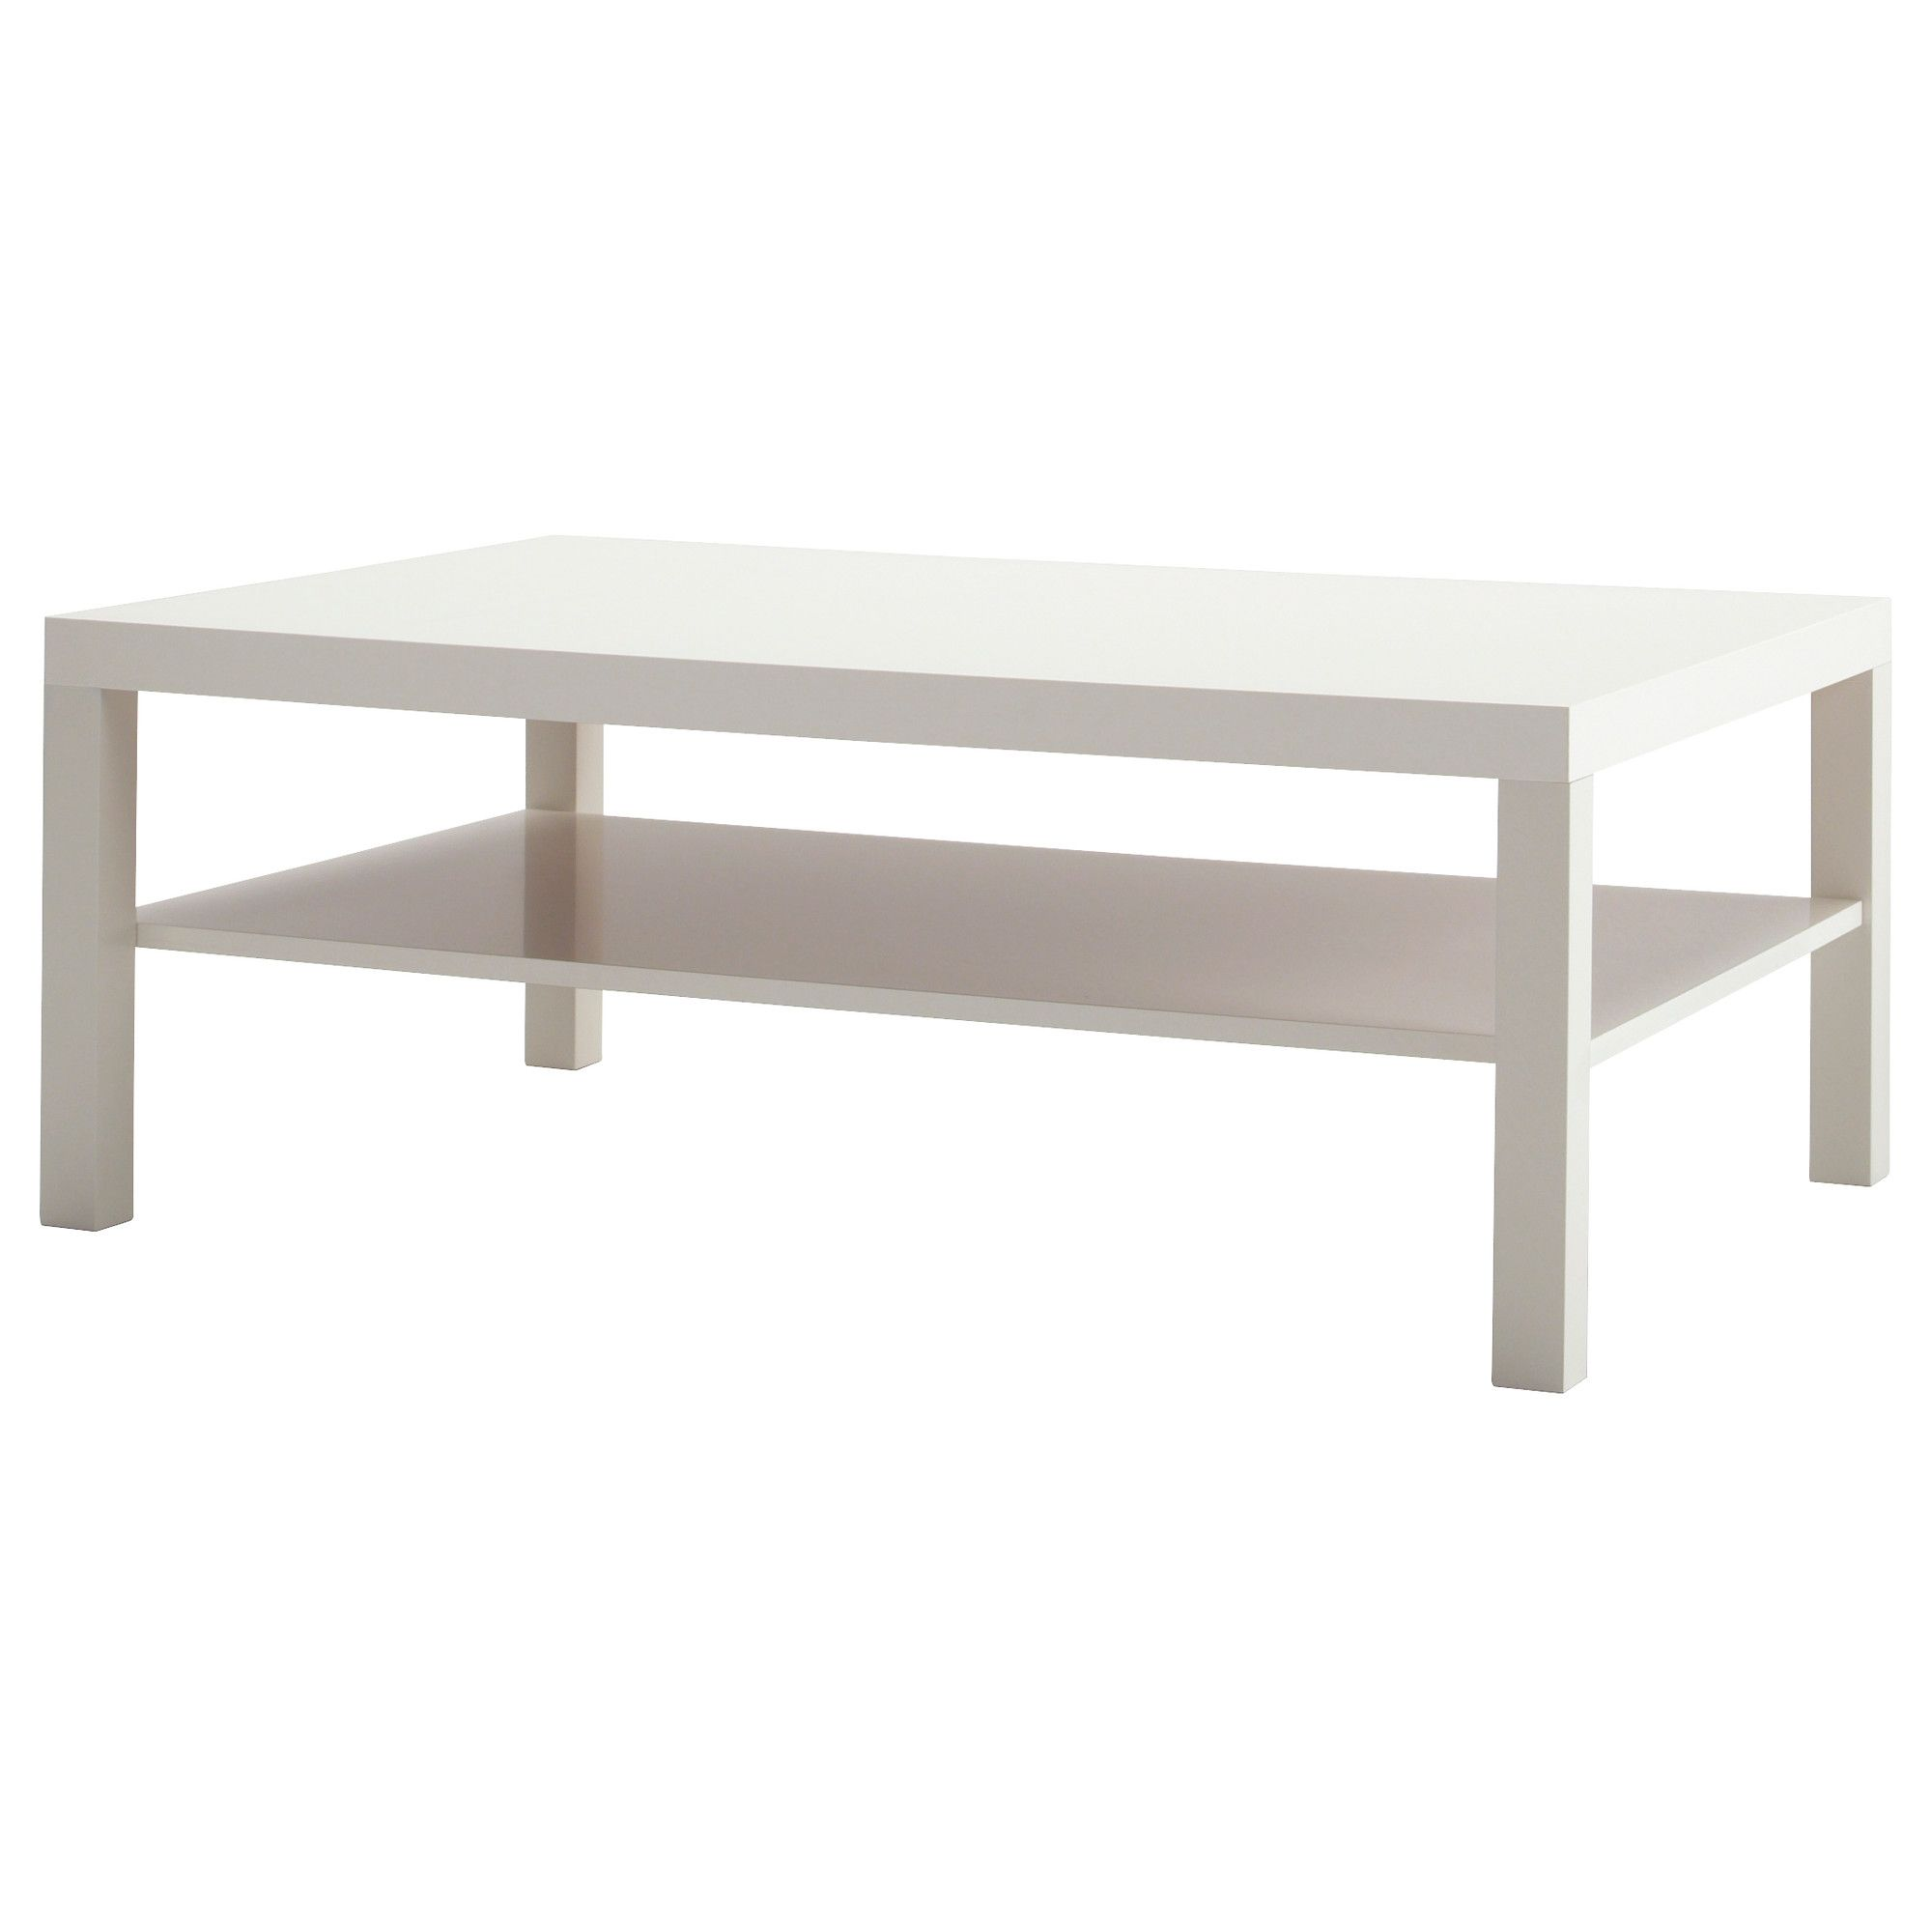 LACK Coffee Table, White